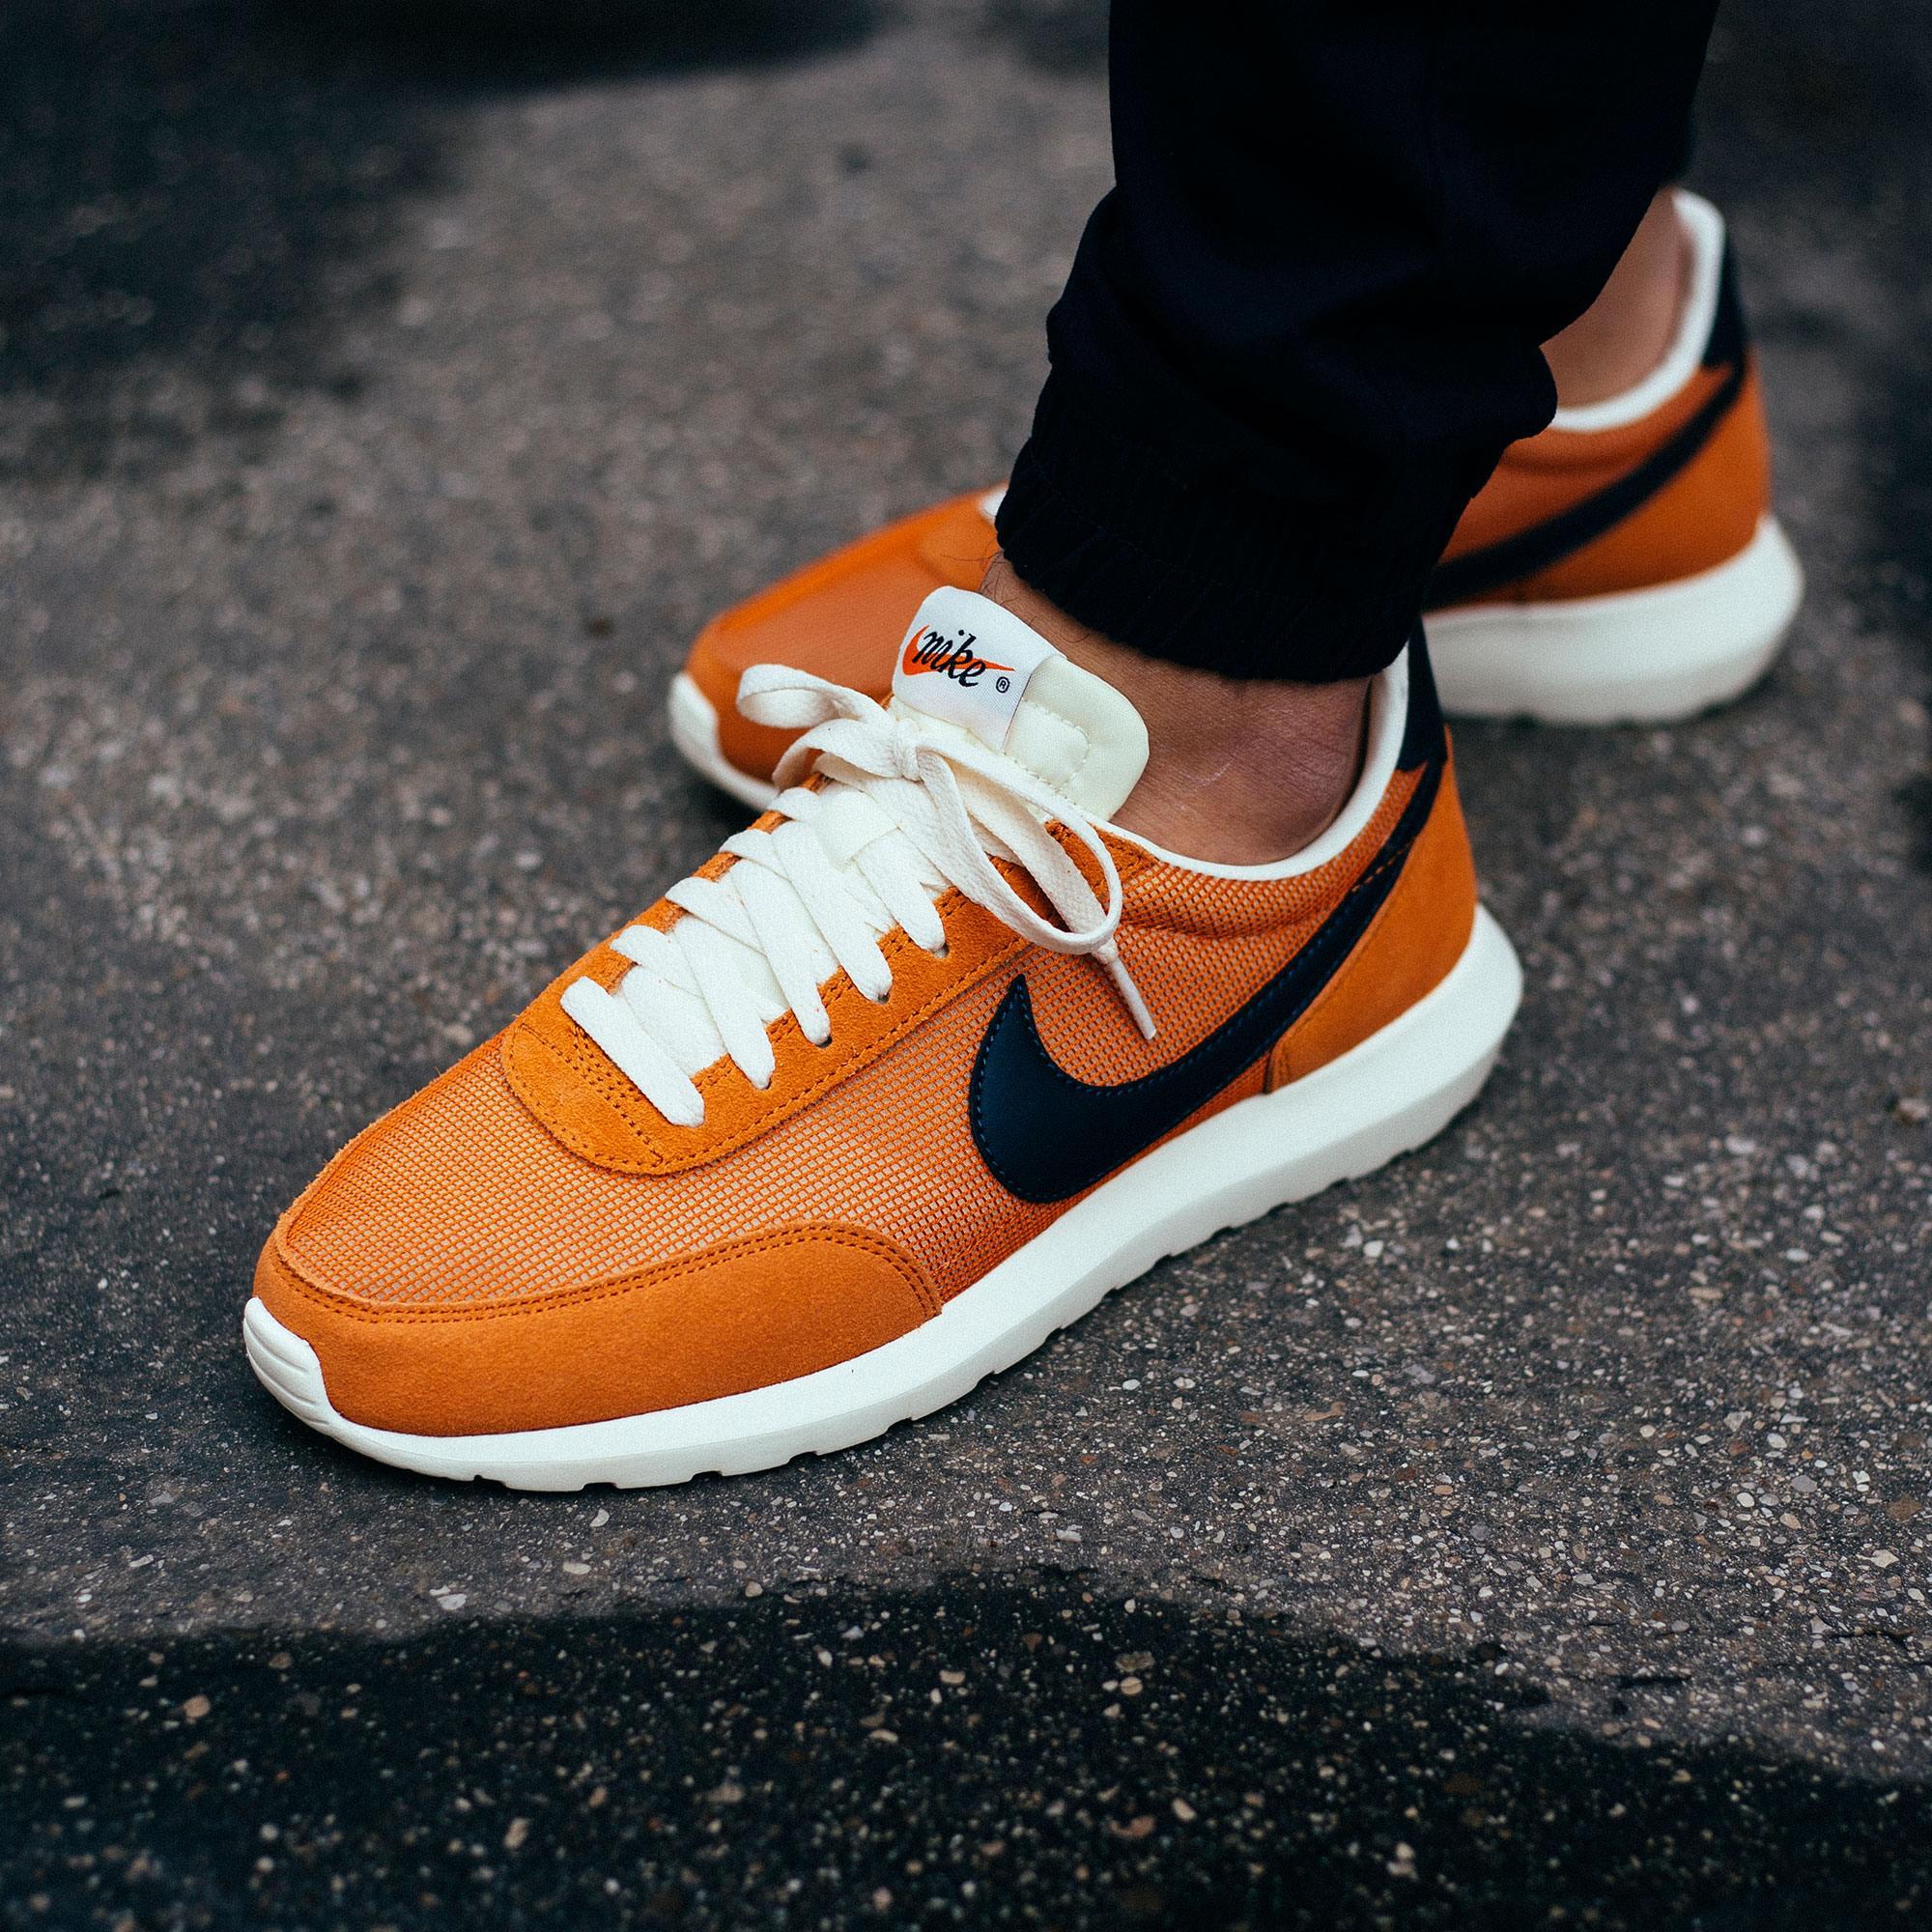 [Nike-Store] Nike Roshe Daybreak Herrenschuh - 3 Farben - fast alle Größen